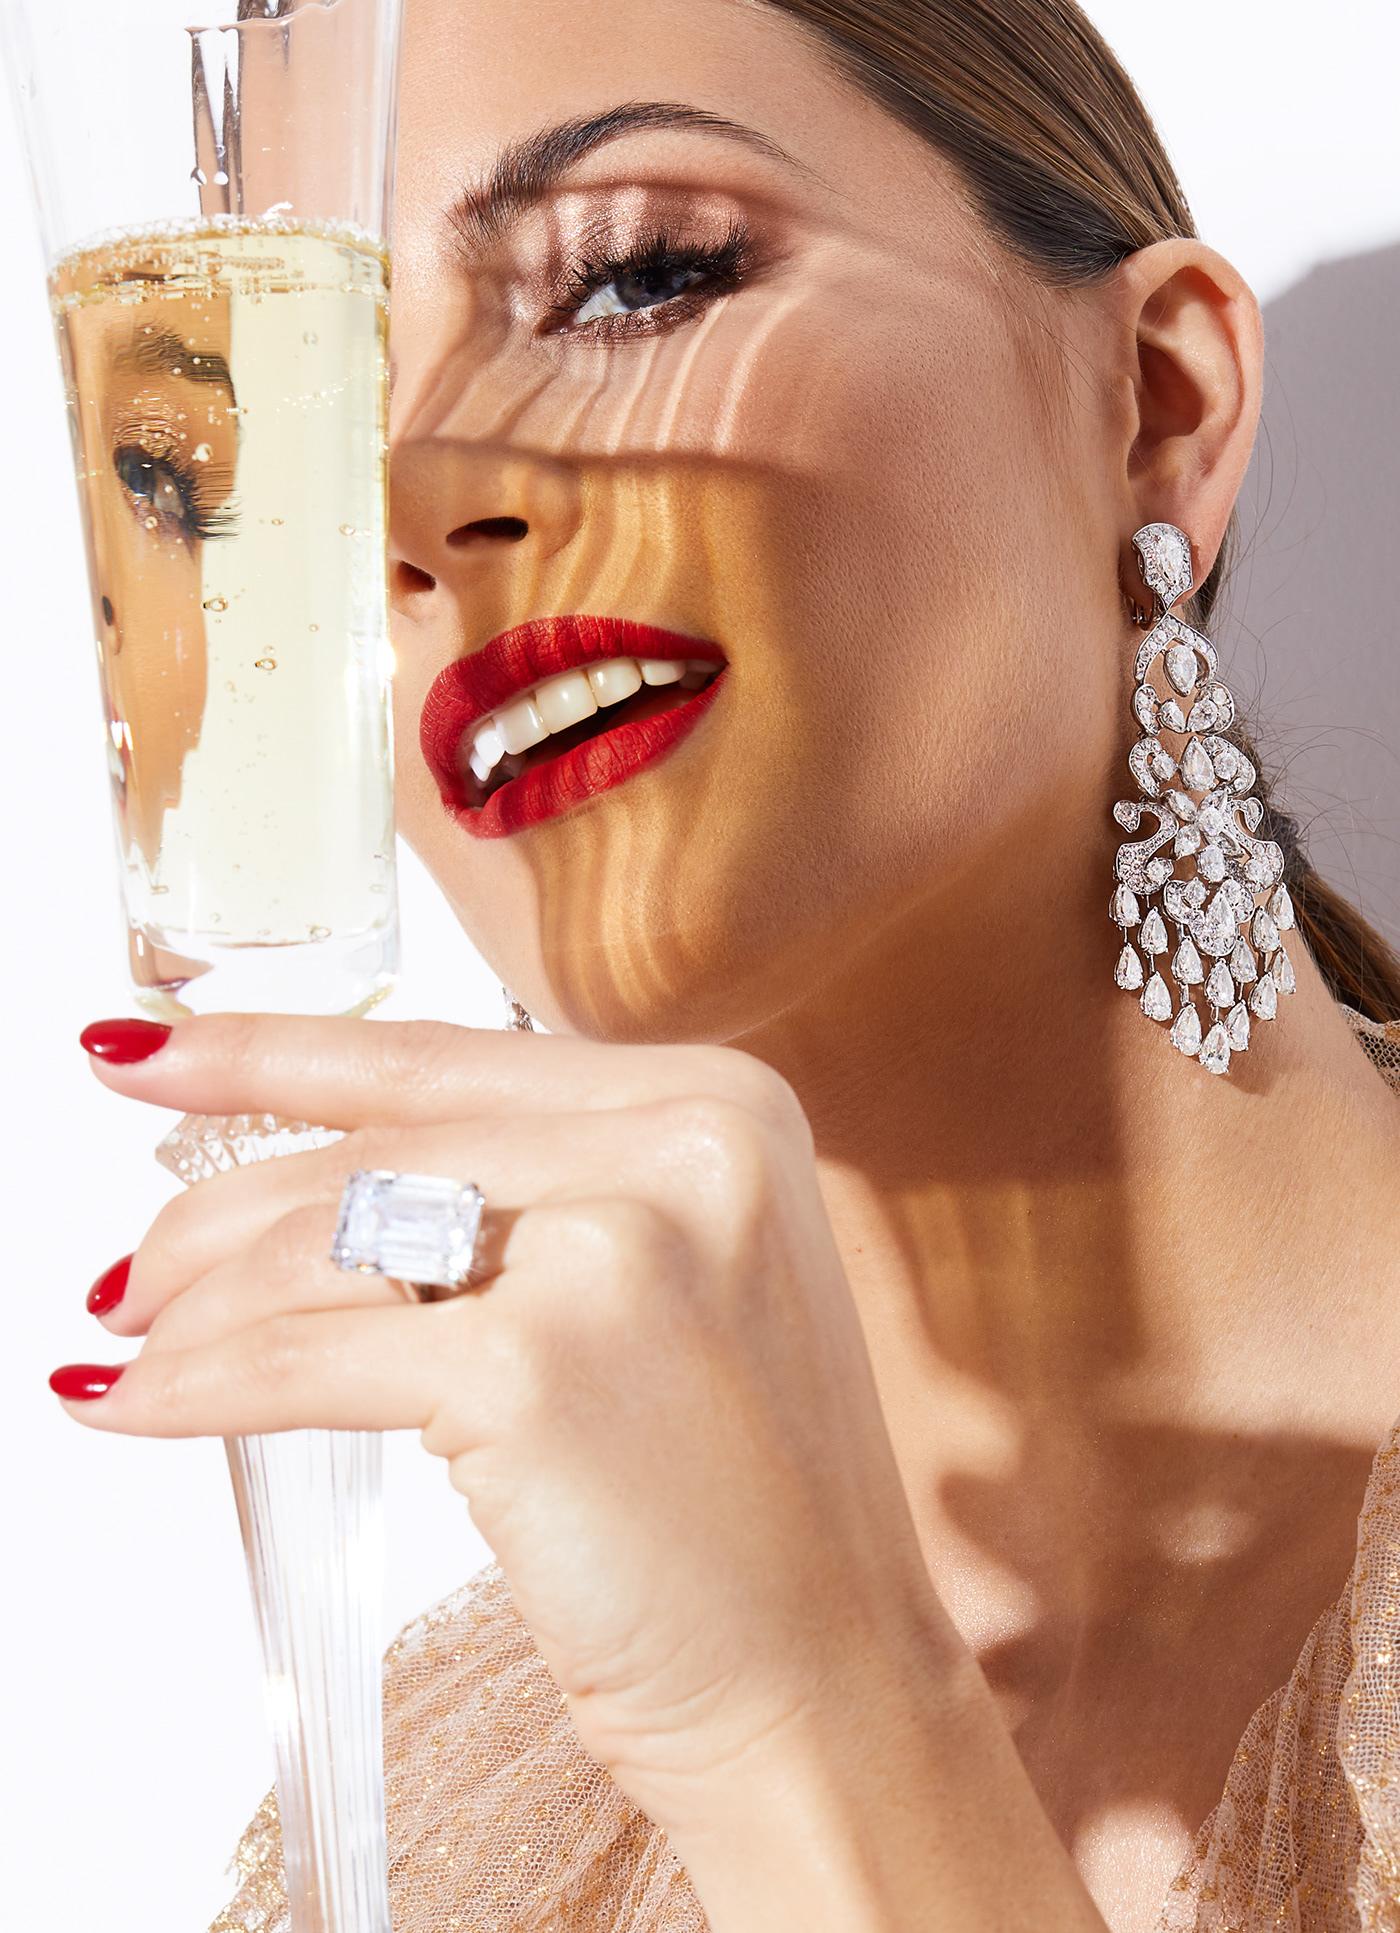 beauty beauty photography close-up diamonds high jewelry jewel jewelry Monaco monte carlo